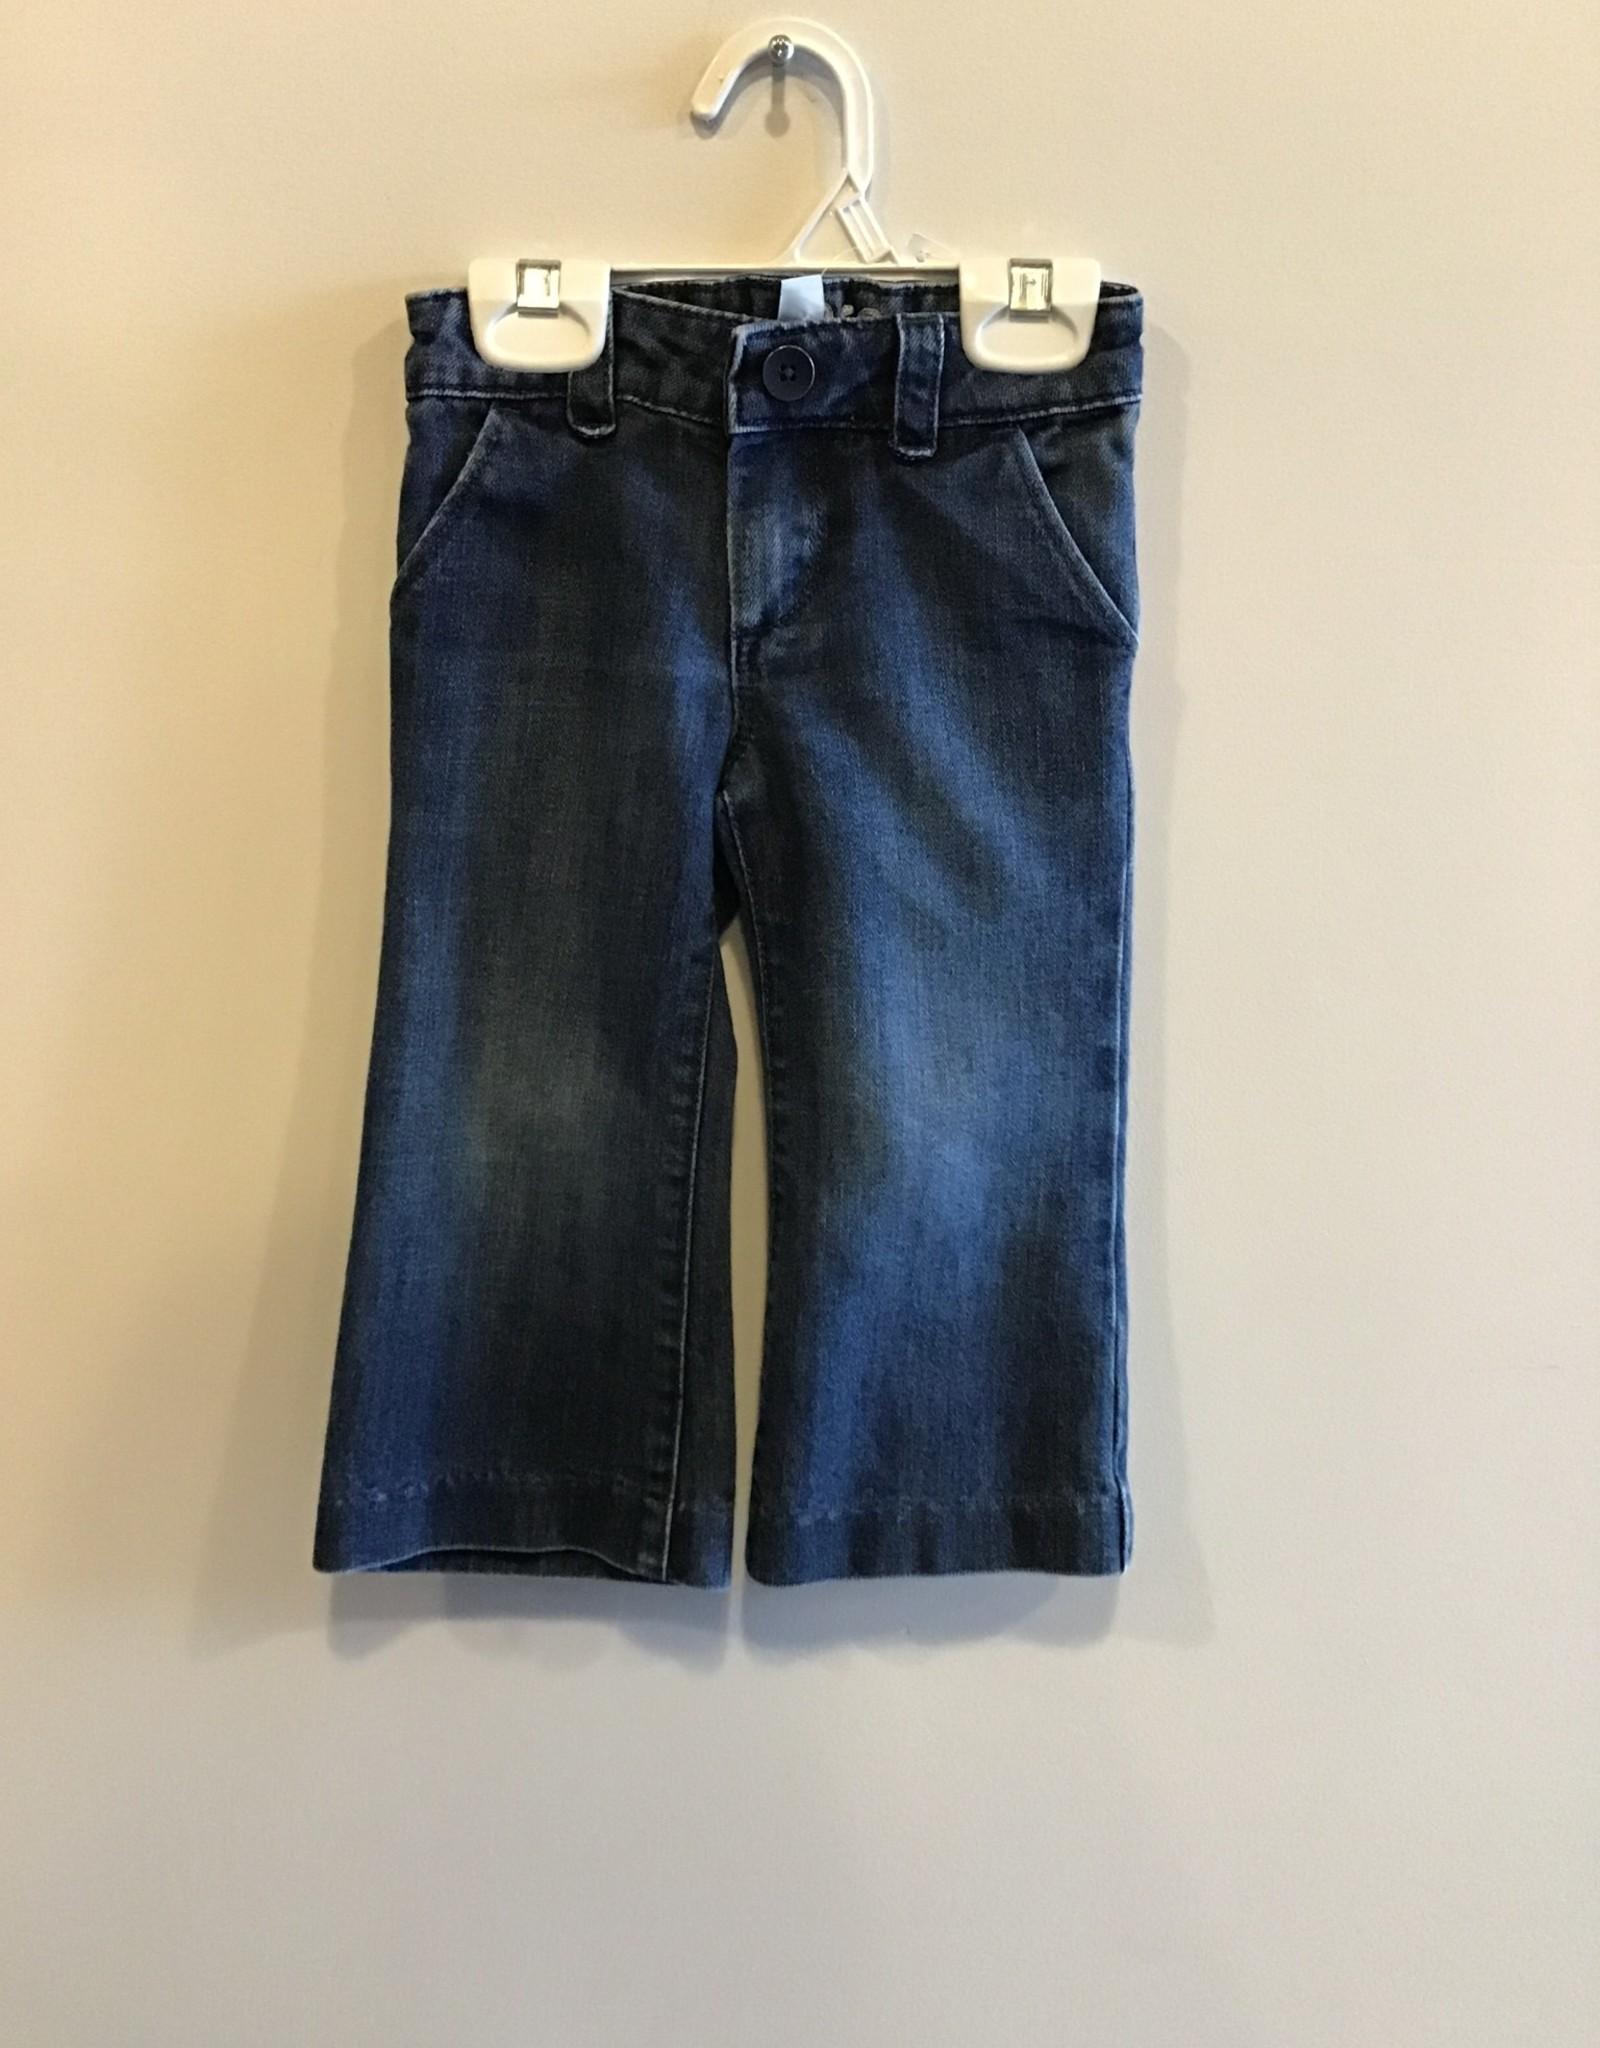 Gap Girls/2T/Gap/Jeans